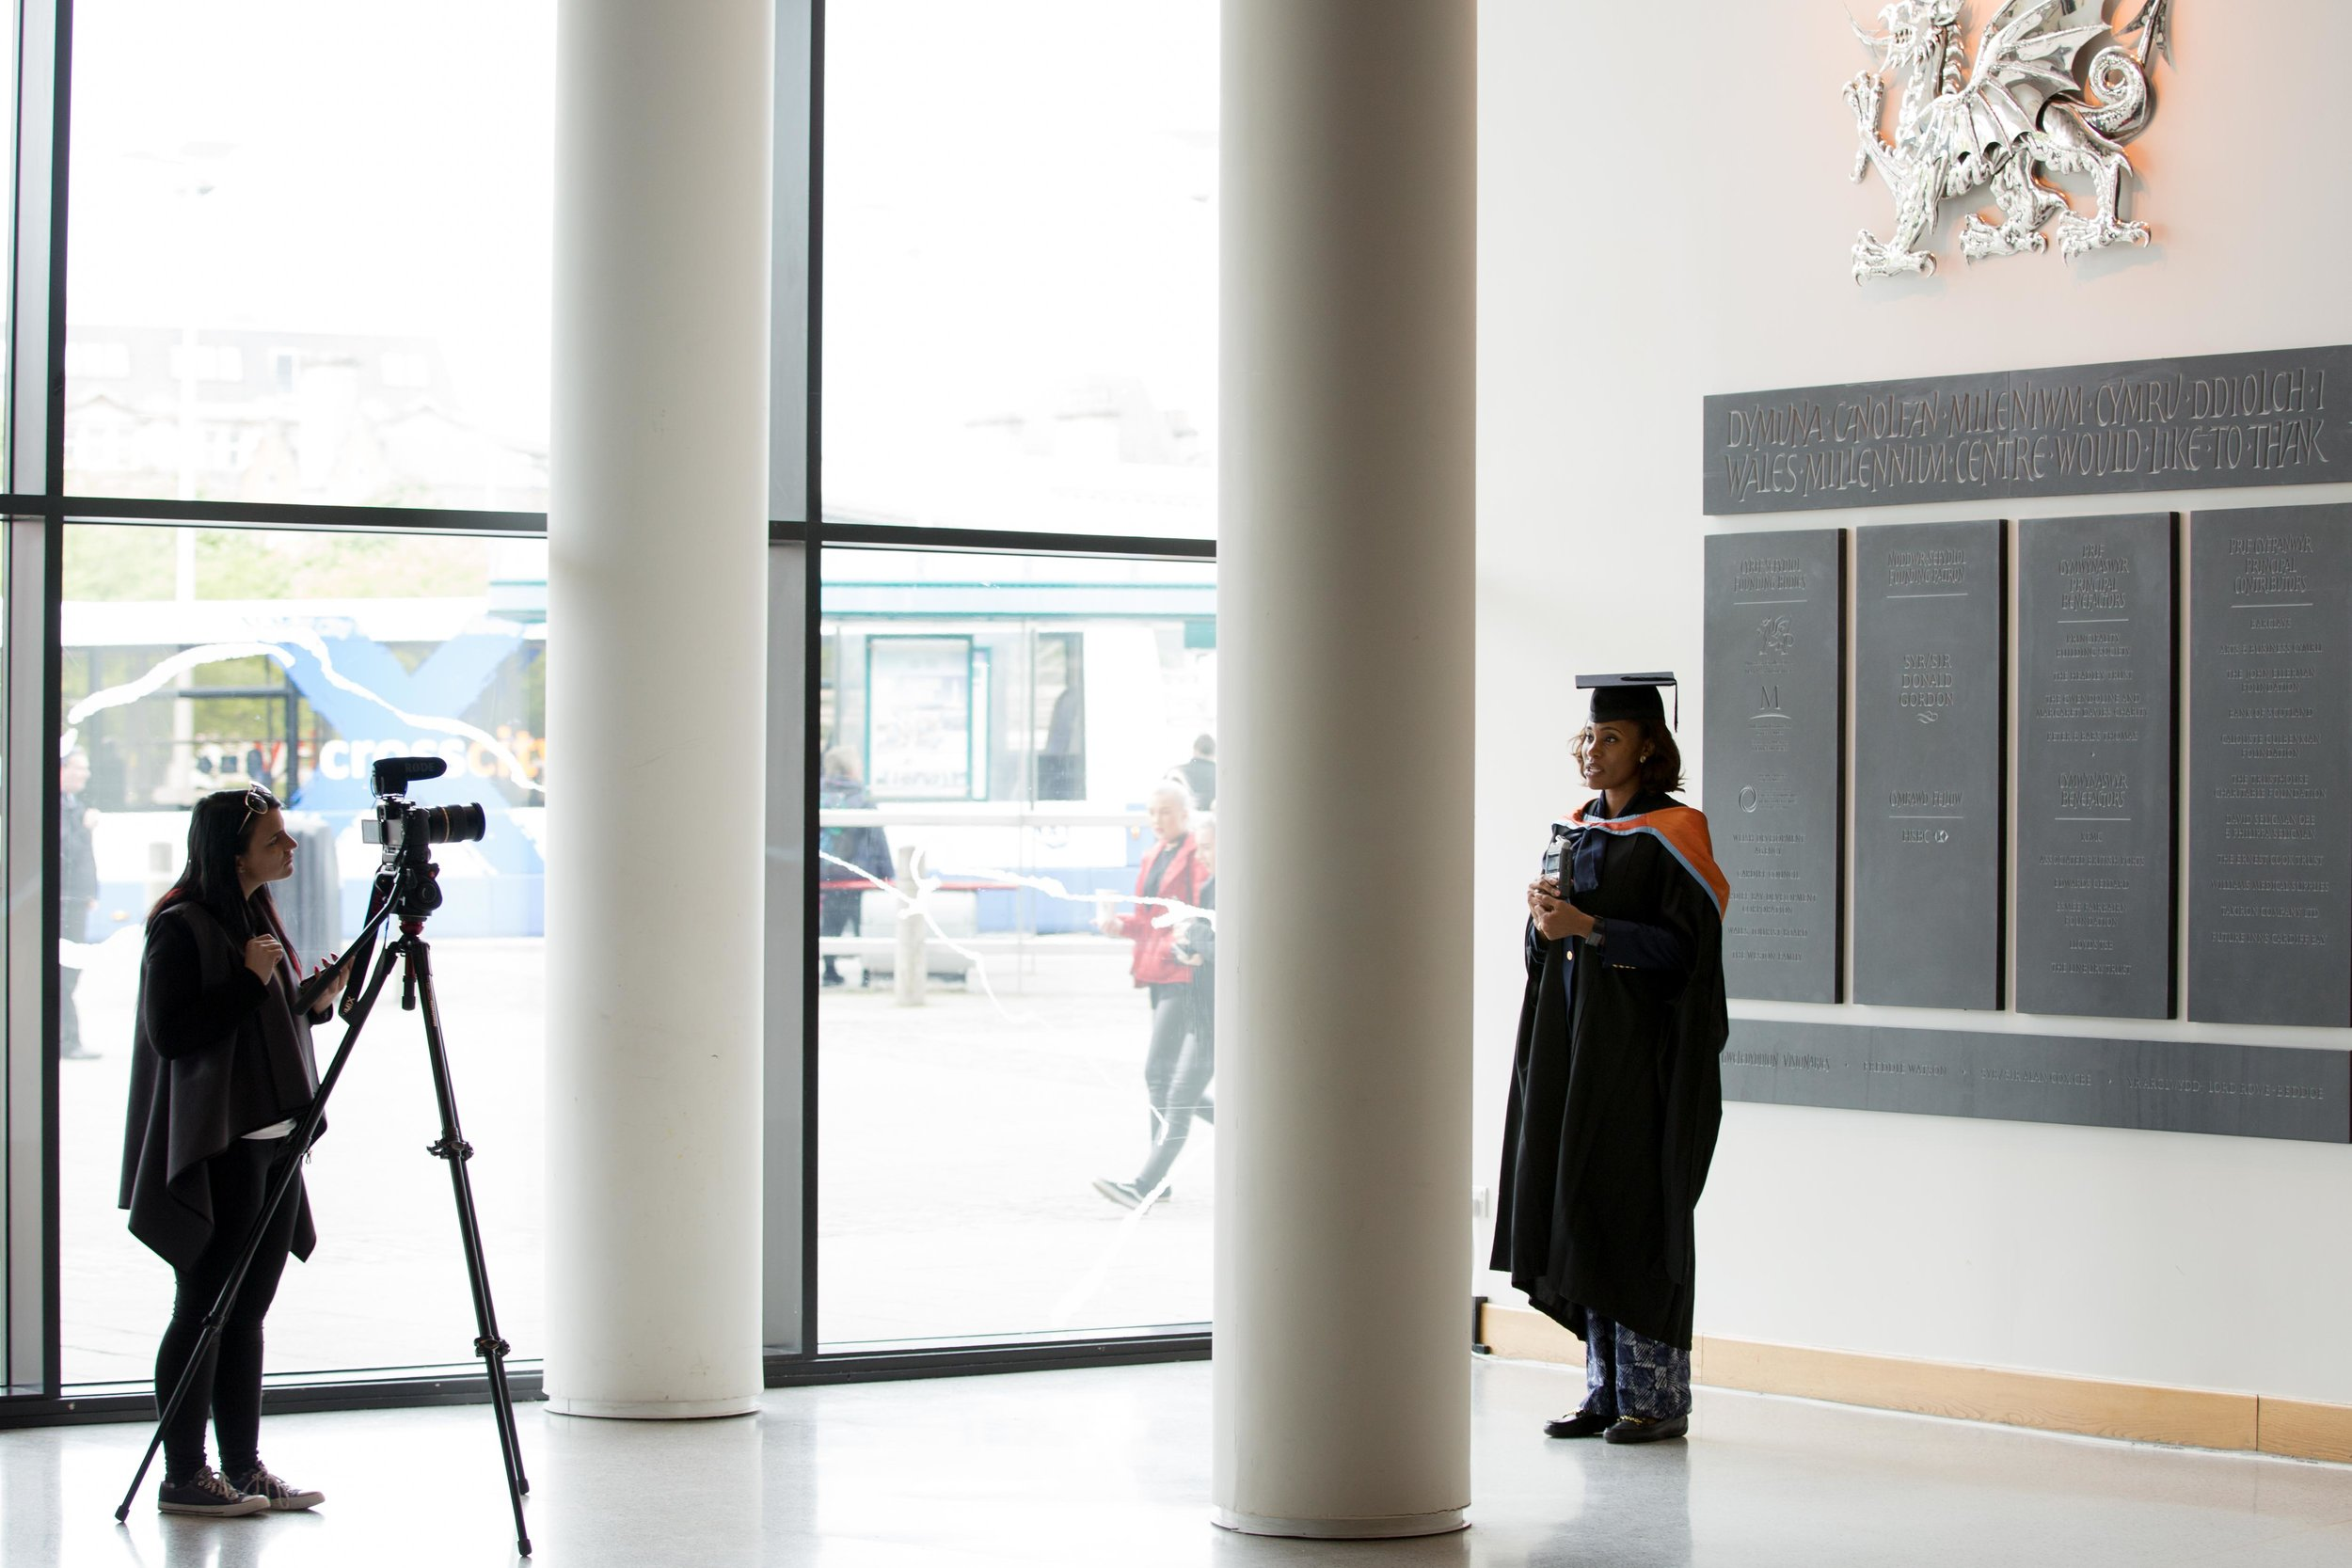 Arden-university-graduation-commercial-photographer-cardiff-natalia-smith-photography-17.jpg